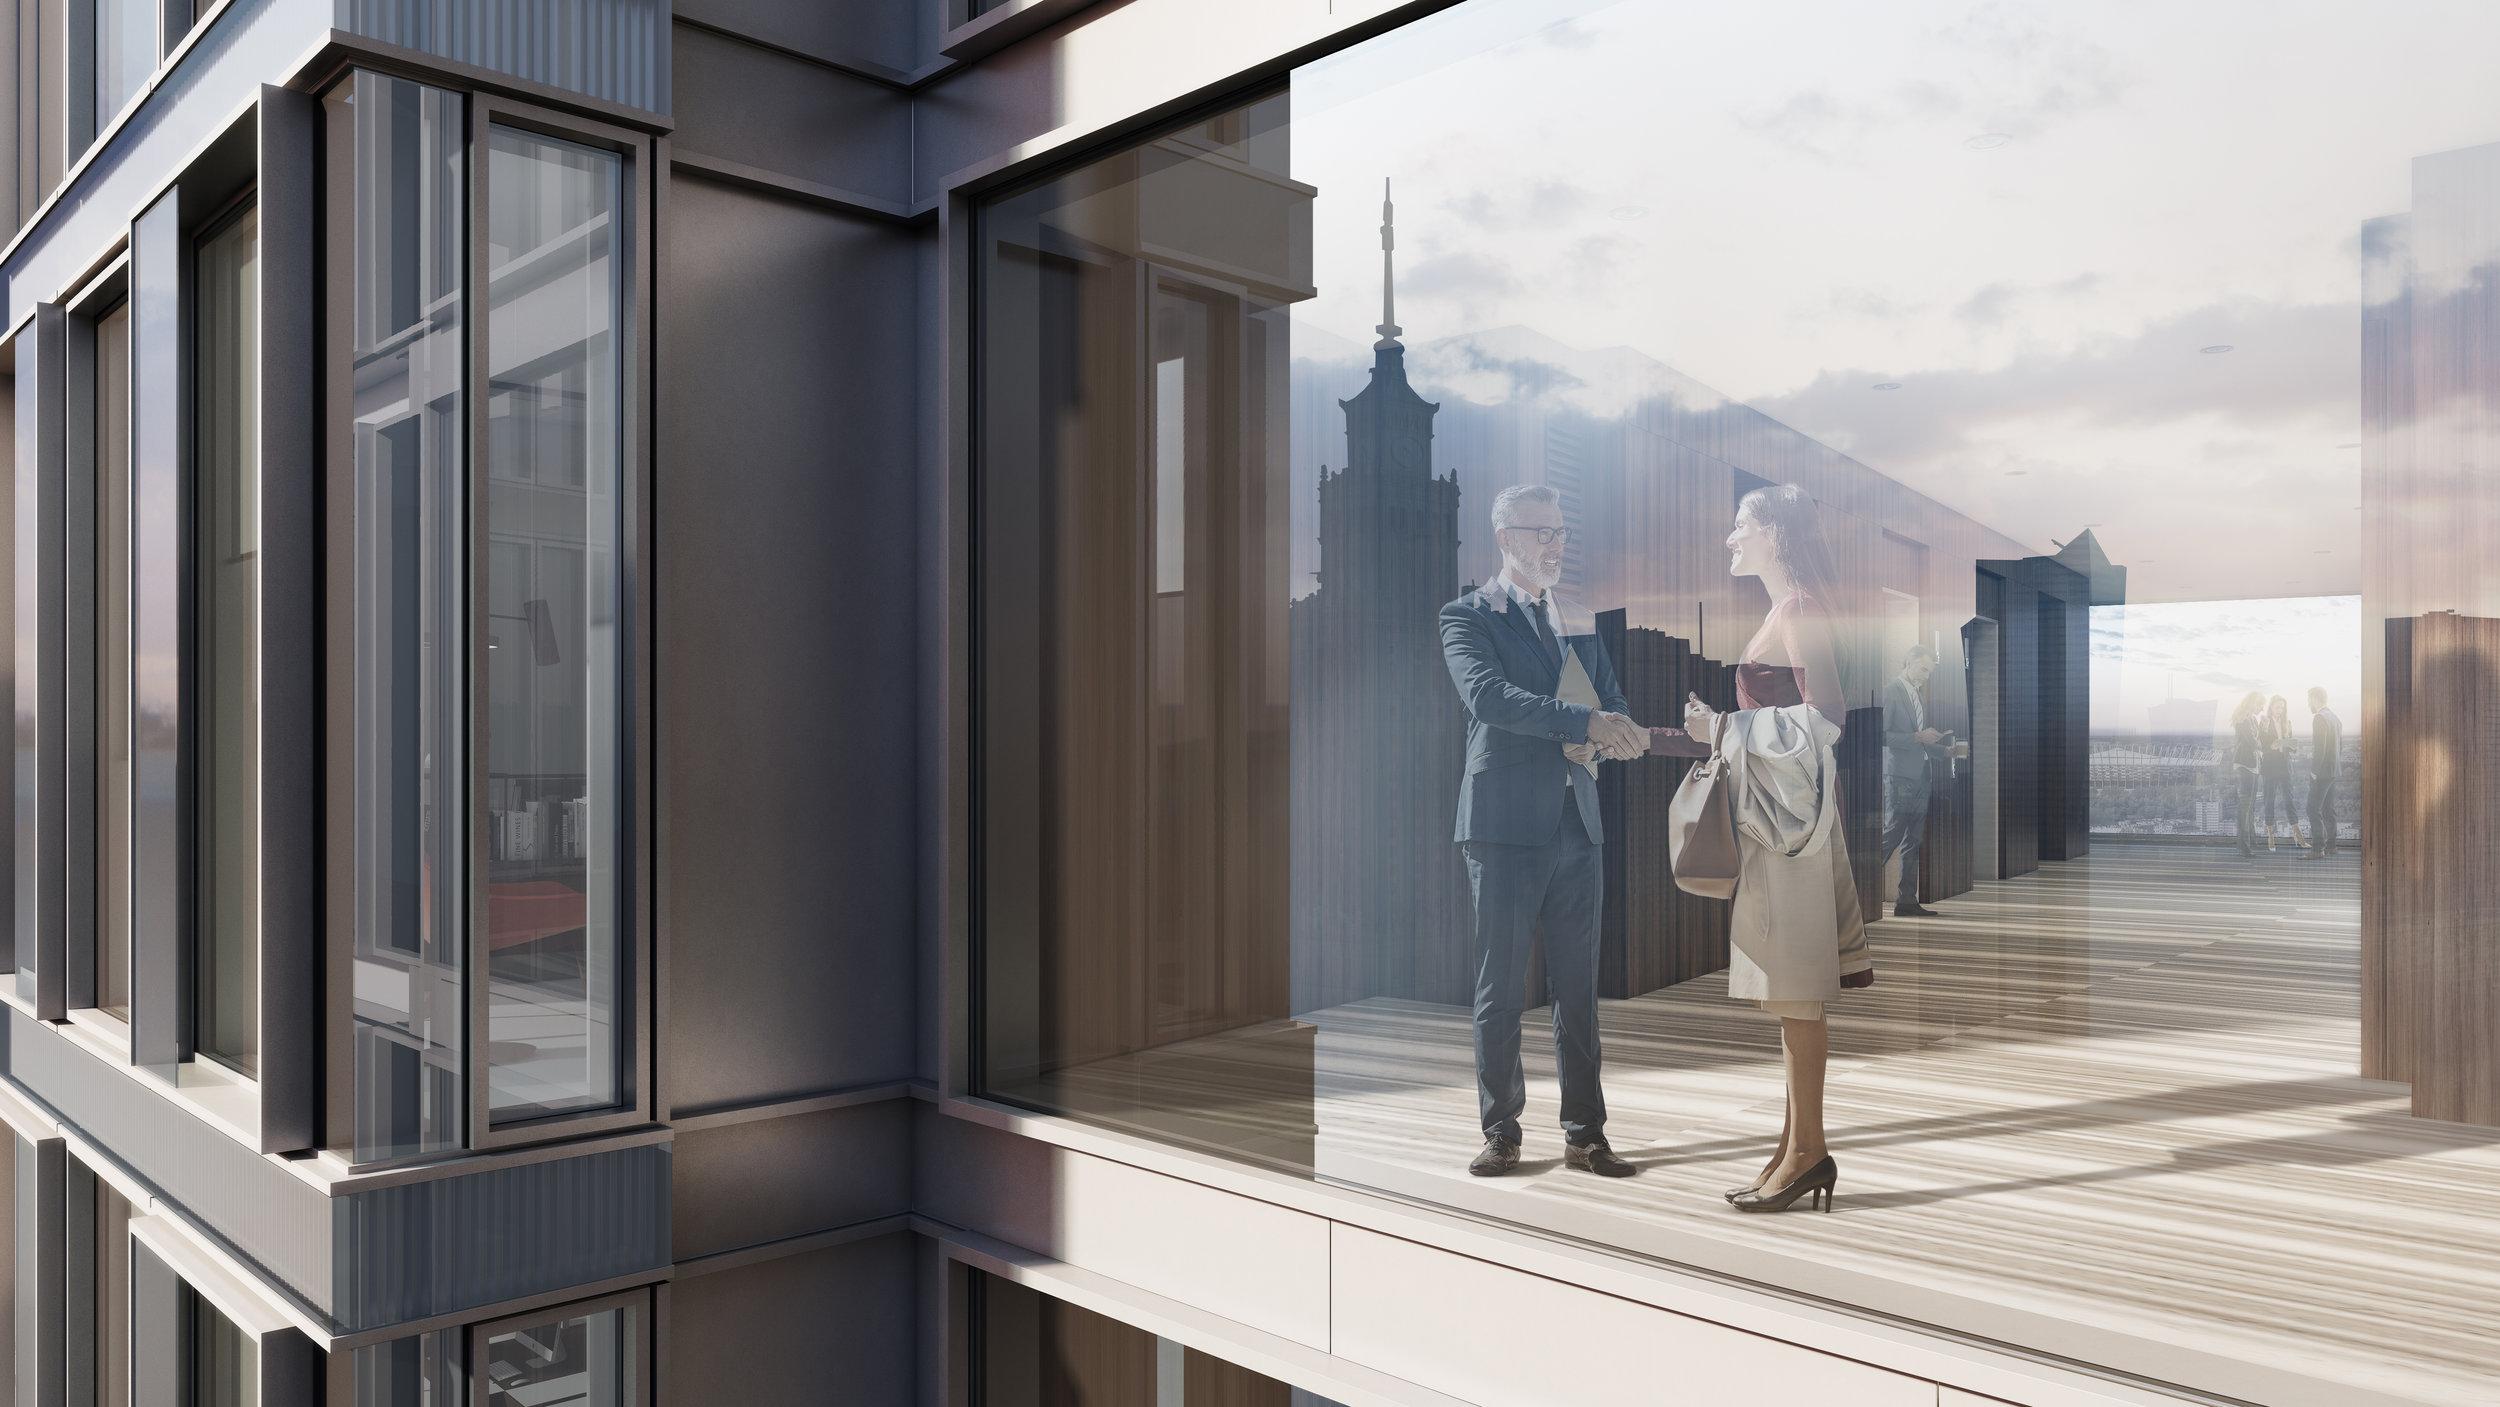 201808 SB WT Lift Lobby.jpg